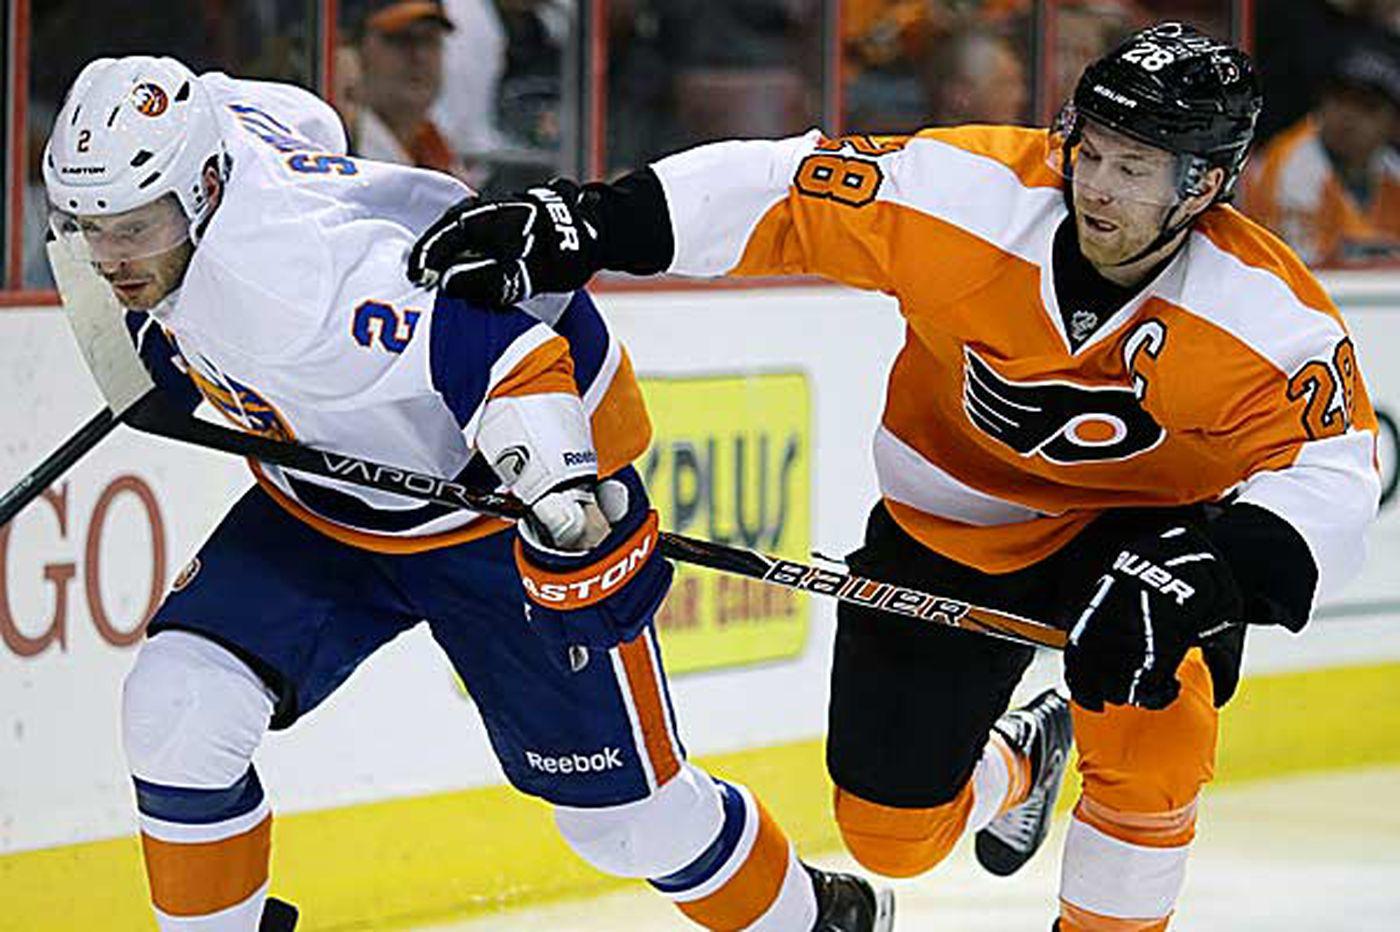 The Flyers' undoing